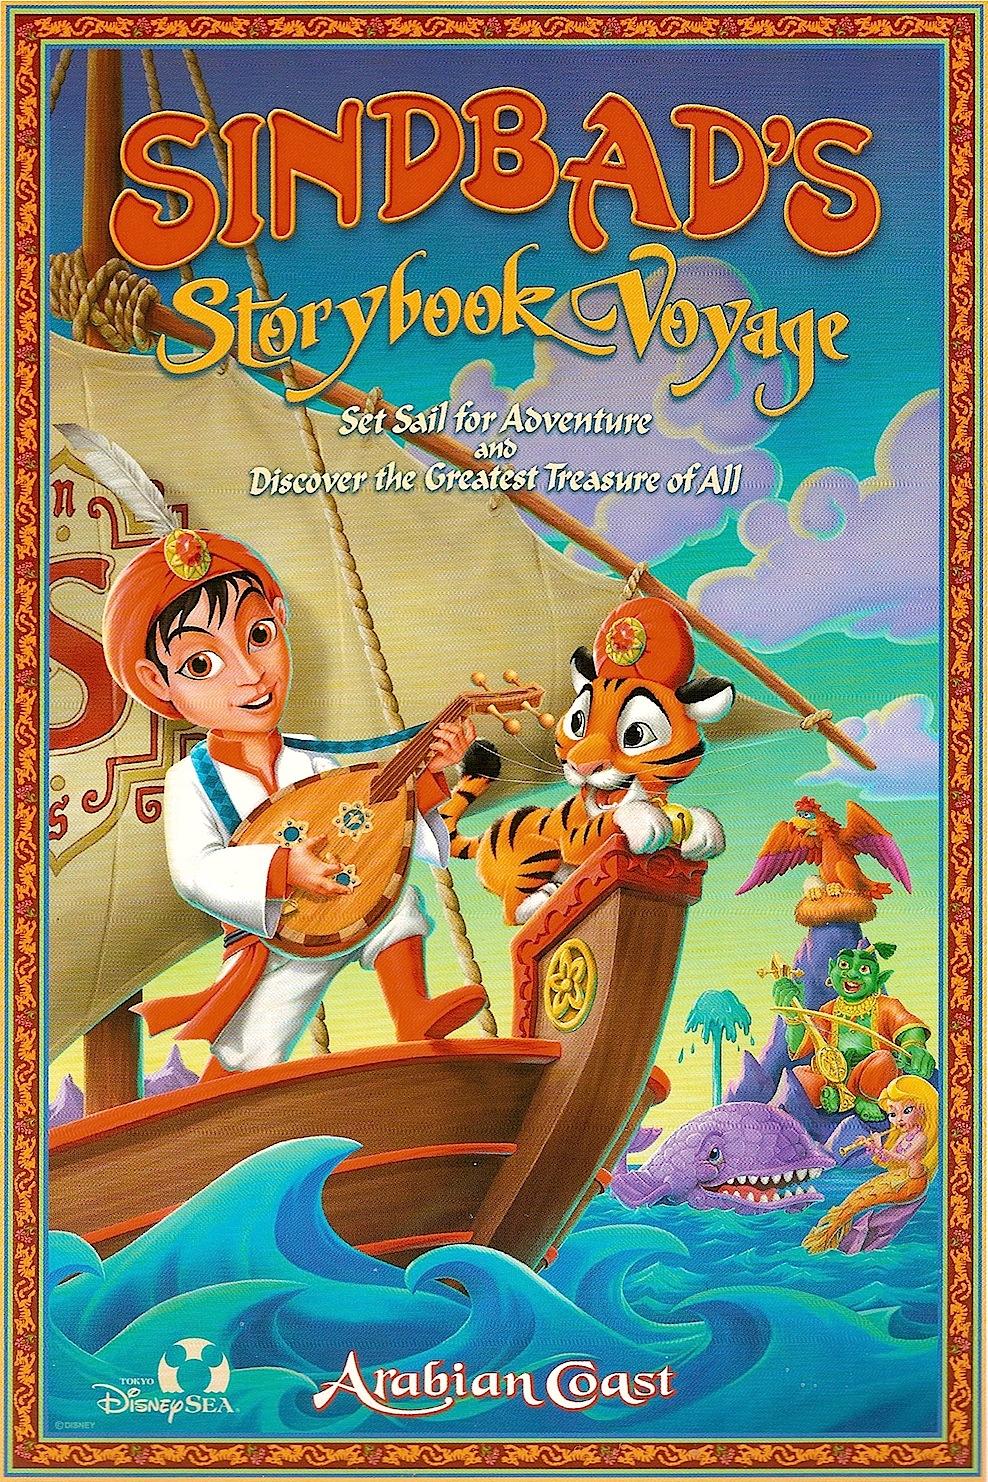 Sindbad's Storybook Voyage